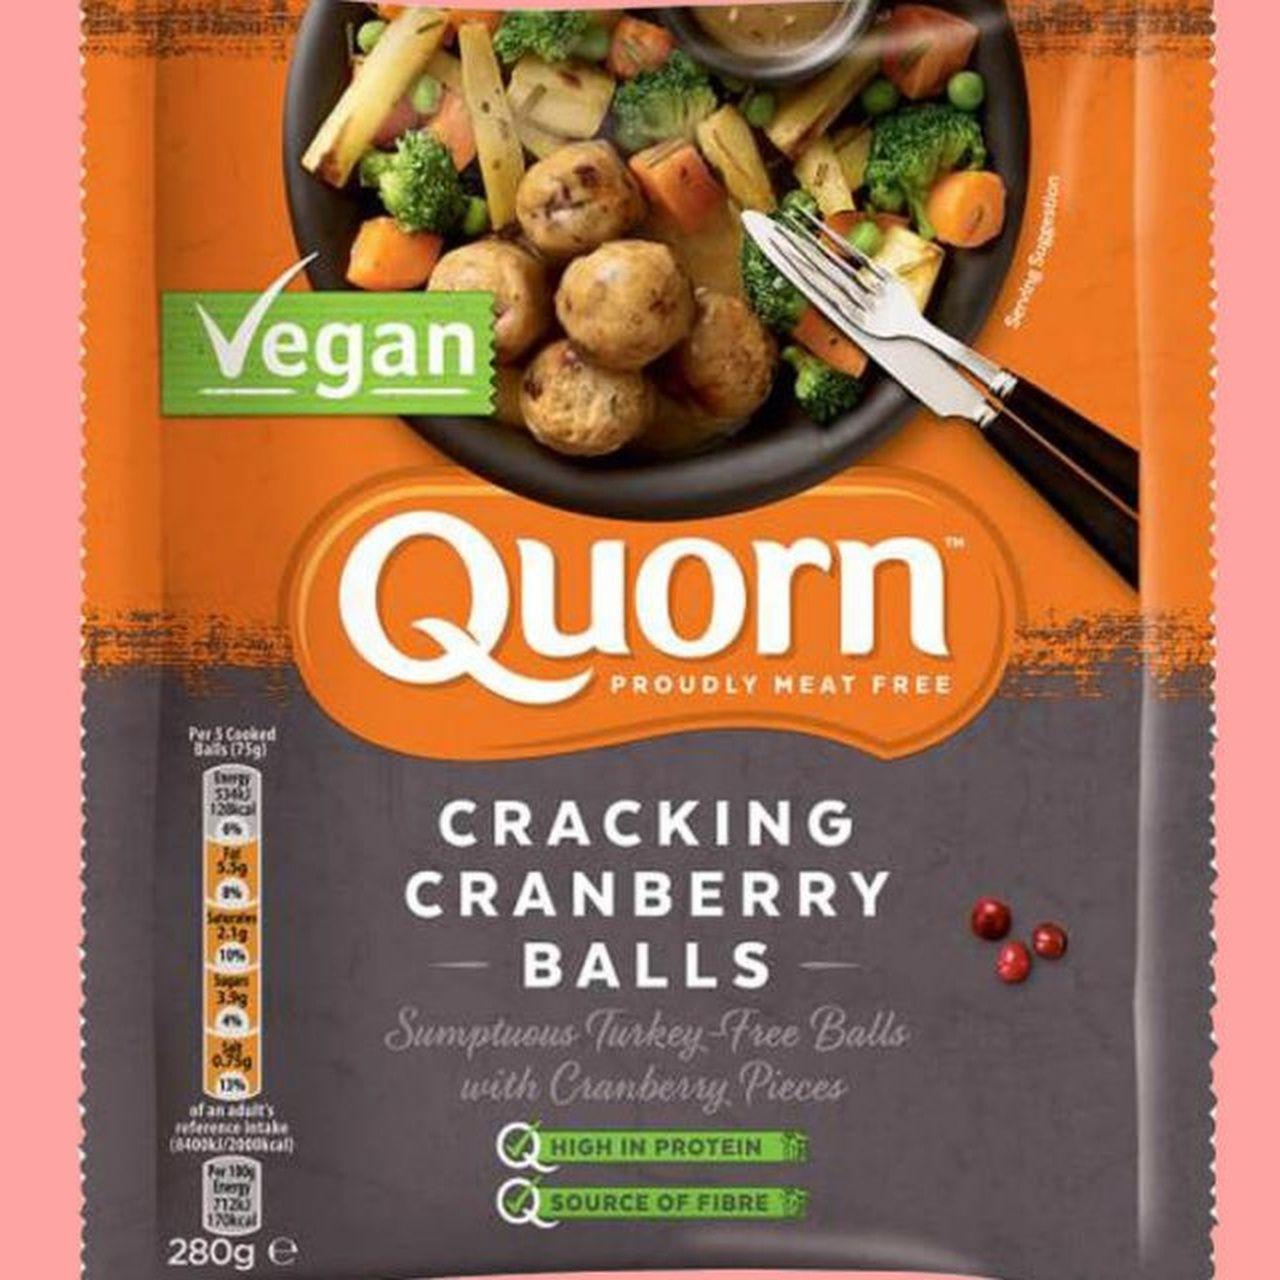 Vegetarian Meat Brand Quorn Launches Festive Vegan Turkey Cracking Cranberry Balls Quorn Vegan Turkey Vegan Supermarket